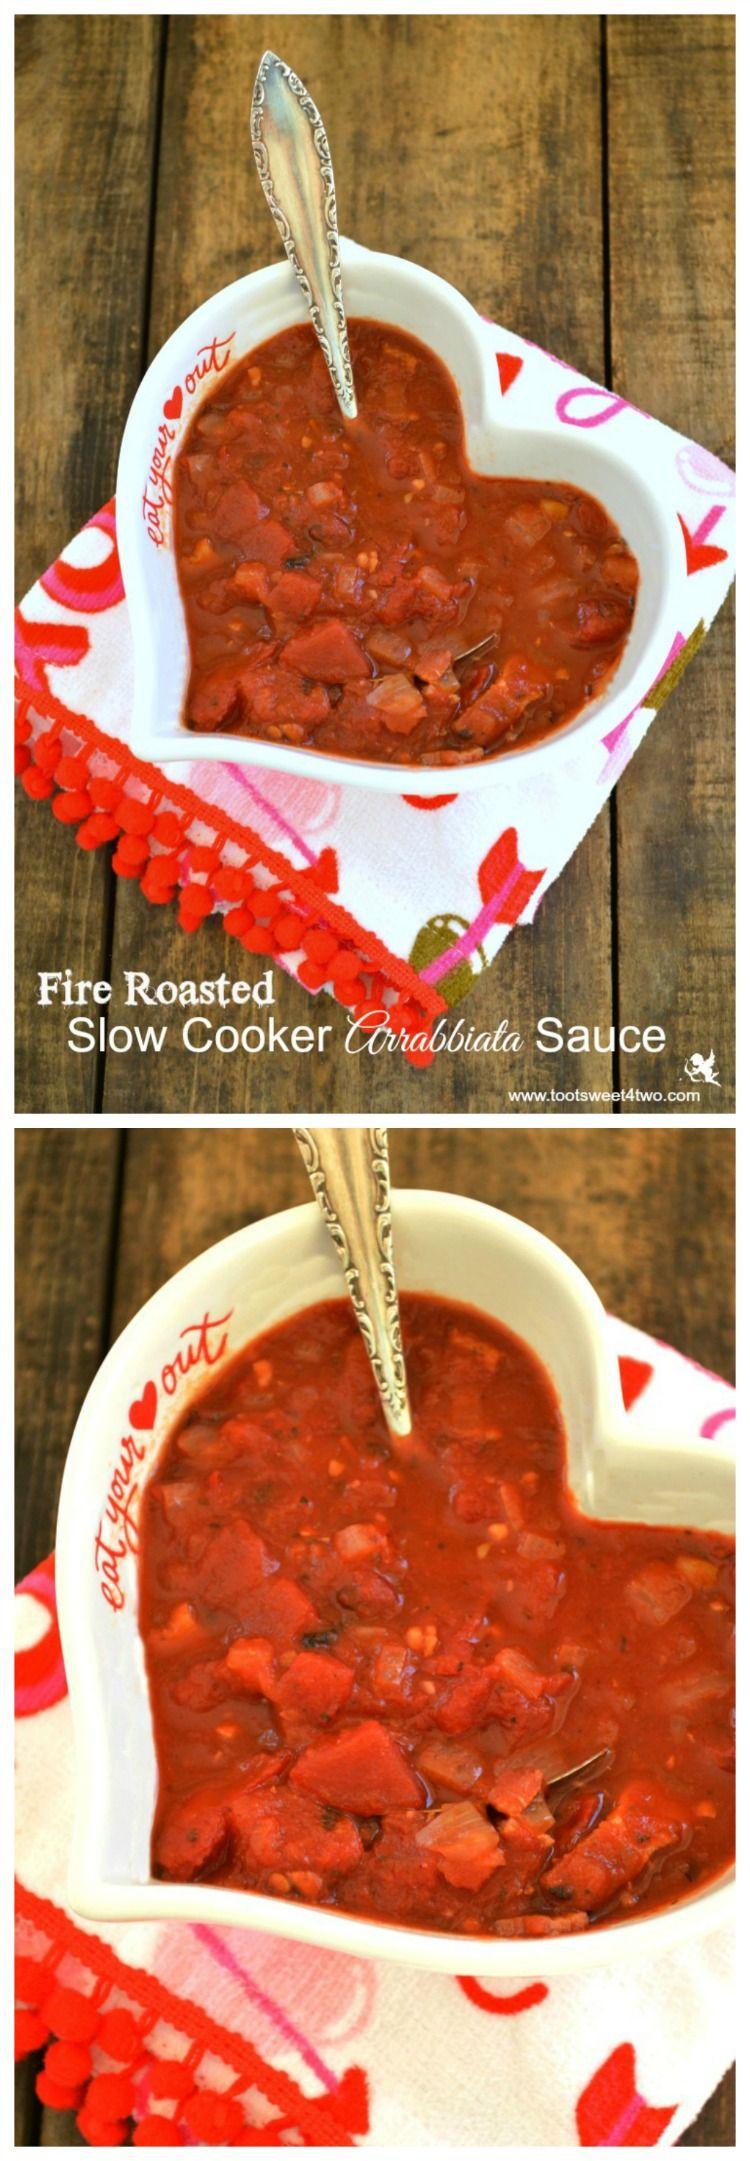 Fire Roasted Slow Cooker Arrabbiata Sauce collage